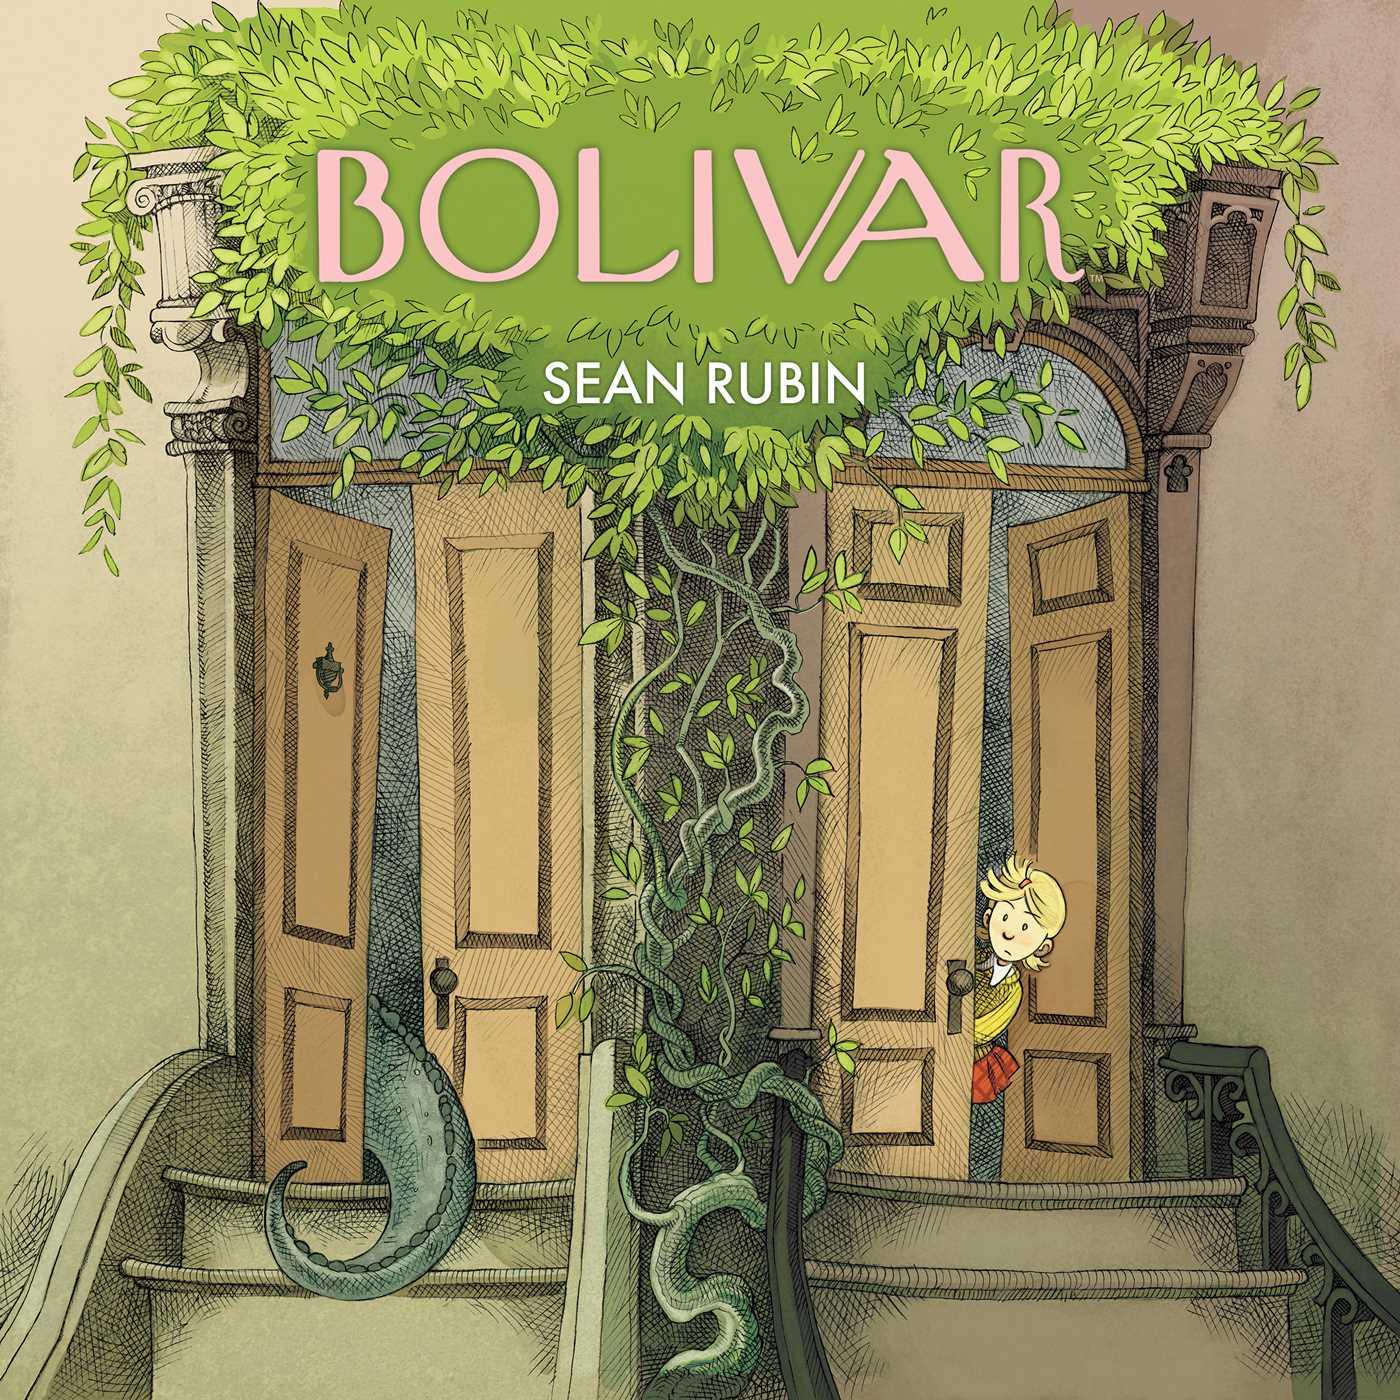 Bolivar 9781684150694 hr